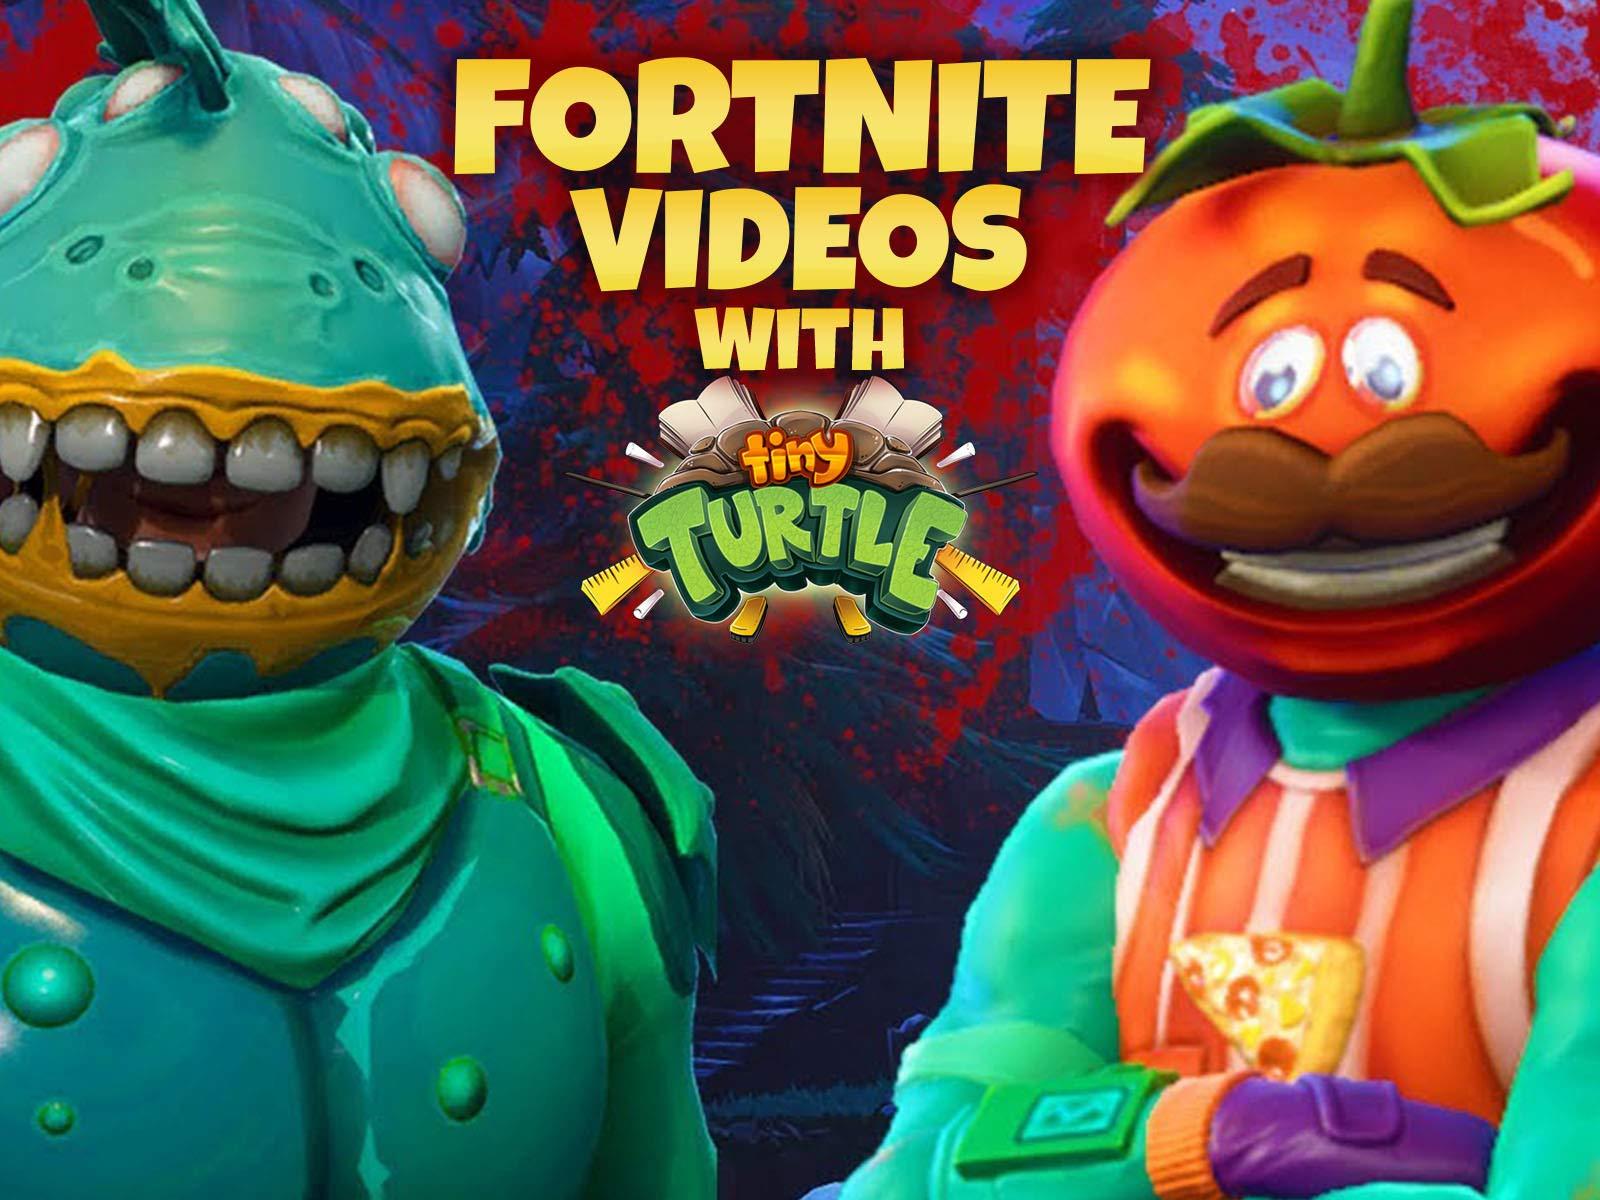 Clip: Fortnite Videos with Tiny Turtle - Season 1